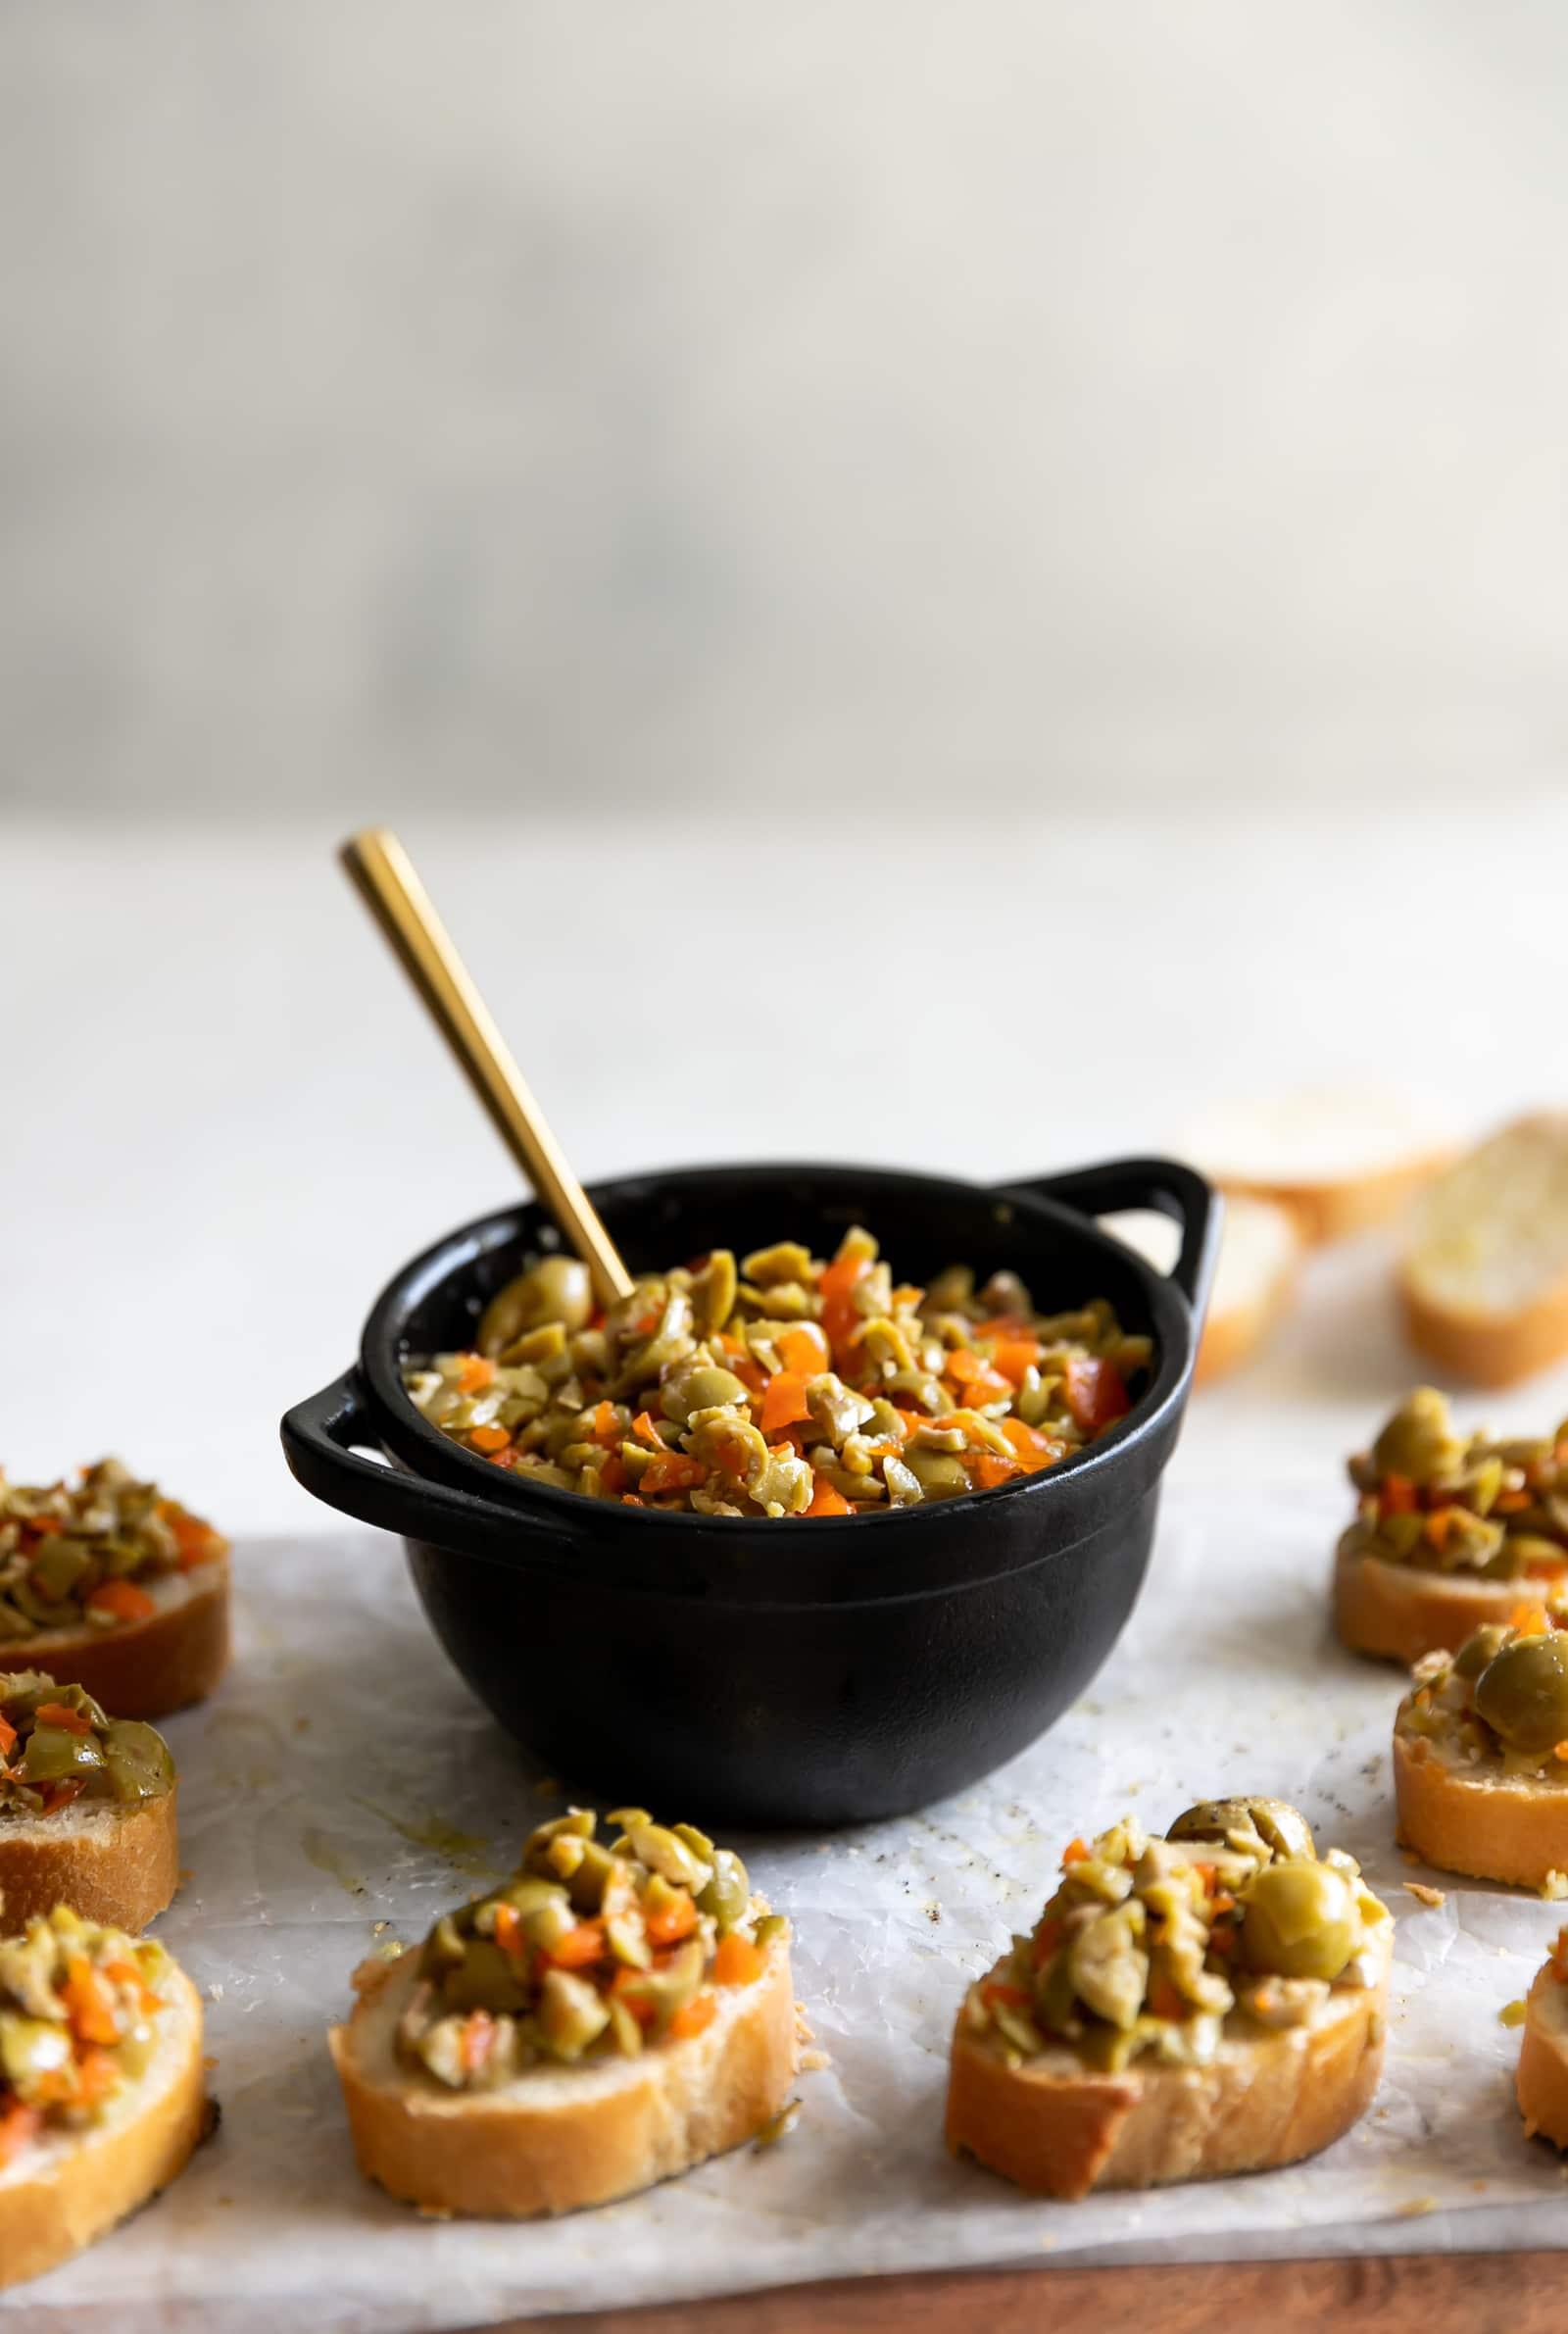 5-Ingredient Olive Bruschetta Crostini - A Sassy Spoon